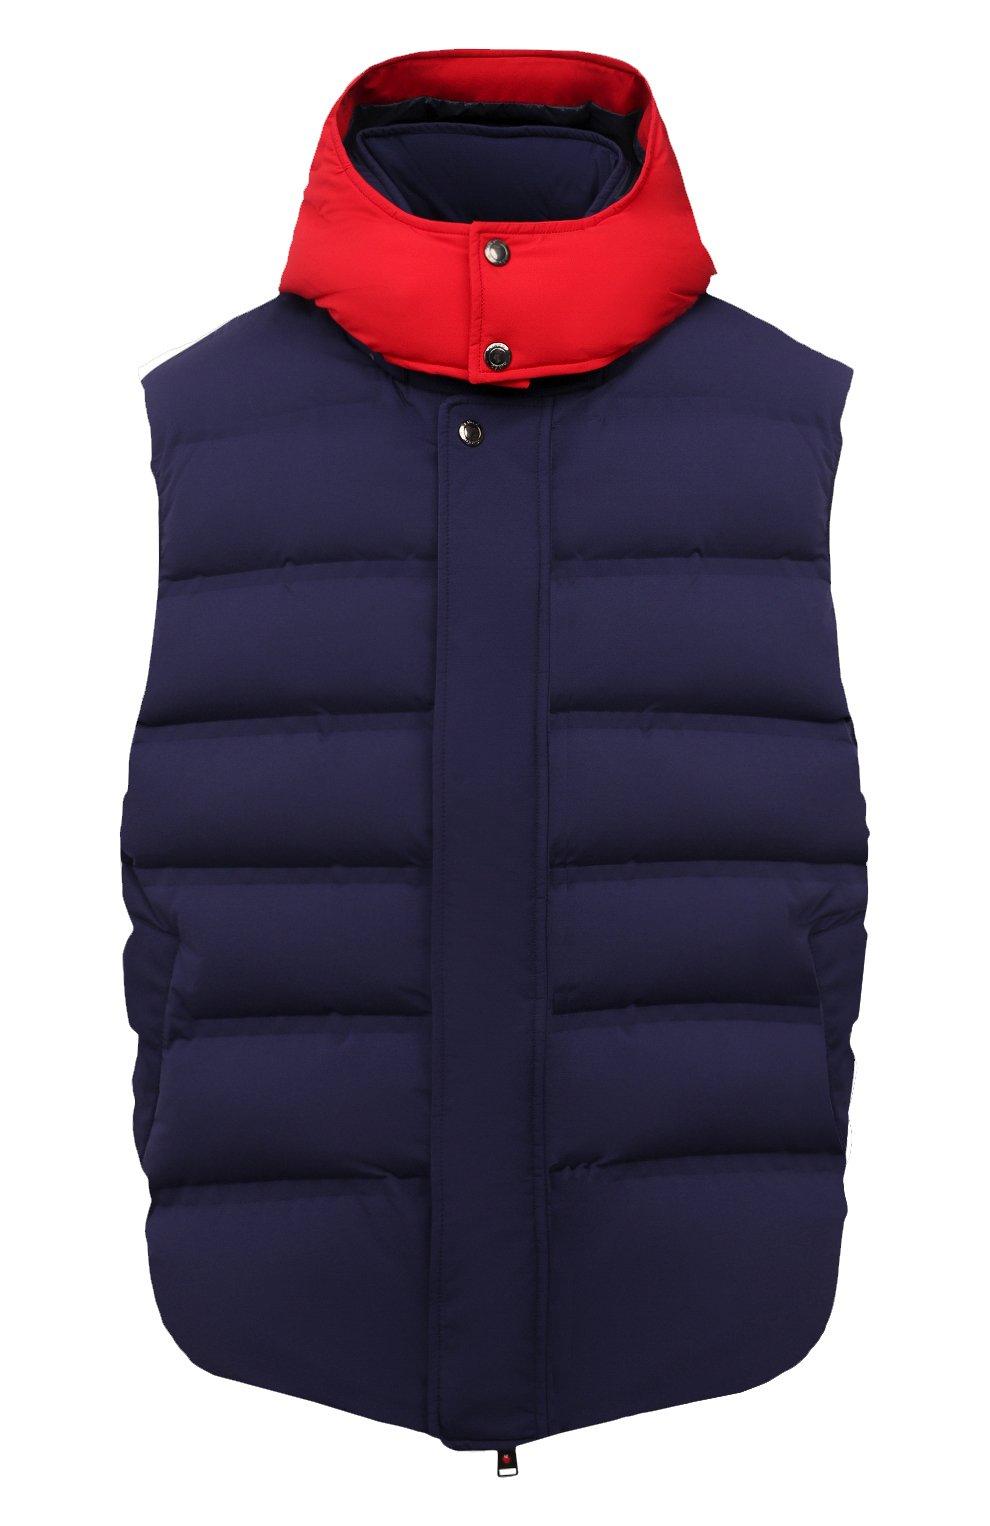 Мужской пуховый жилет KIRED темно-синего цвета, арт. WBREMAW6806518004/62-74 | Фото 1 (Кросс-КТ: Куртка, Пуховик; Big sizes: Big Sizes; Материал внешний: Синтетический материал; Стили: Спорт-шик; Материал подклада: Синтетический материал; Длина (верхняя одежда): Короткие; Материал утеплителя: Пух и перо)